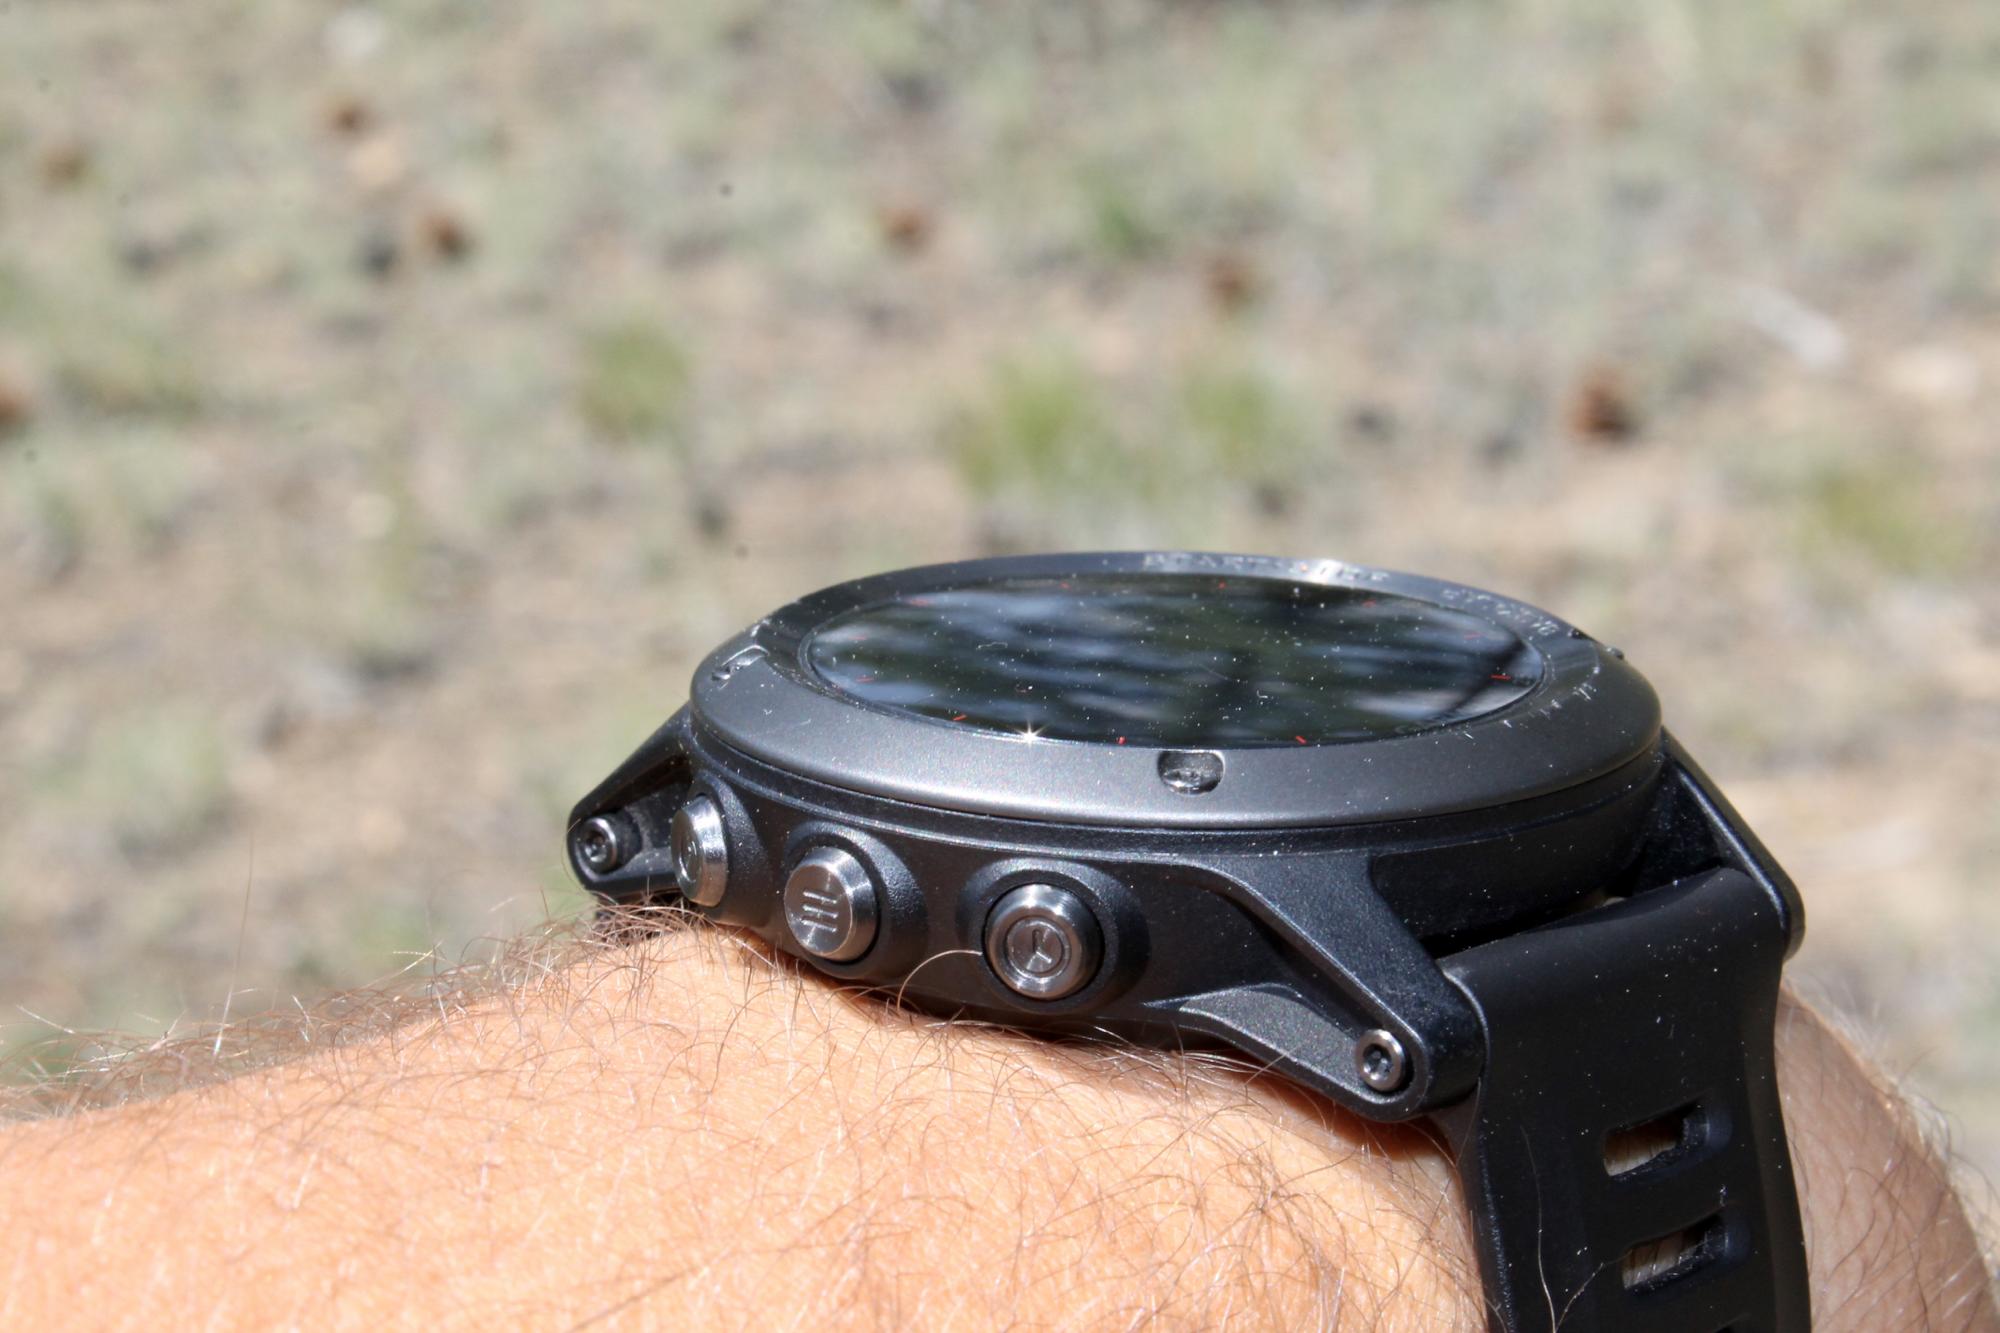 Garmin S Fenix 3 Gps Watch Stands The Test Of Time Singletracks